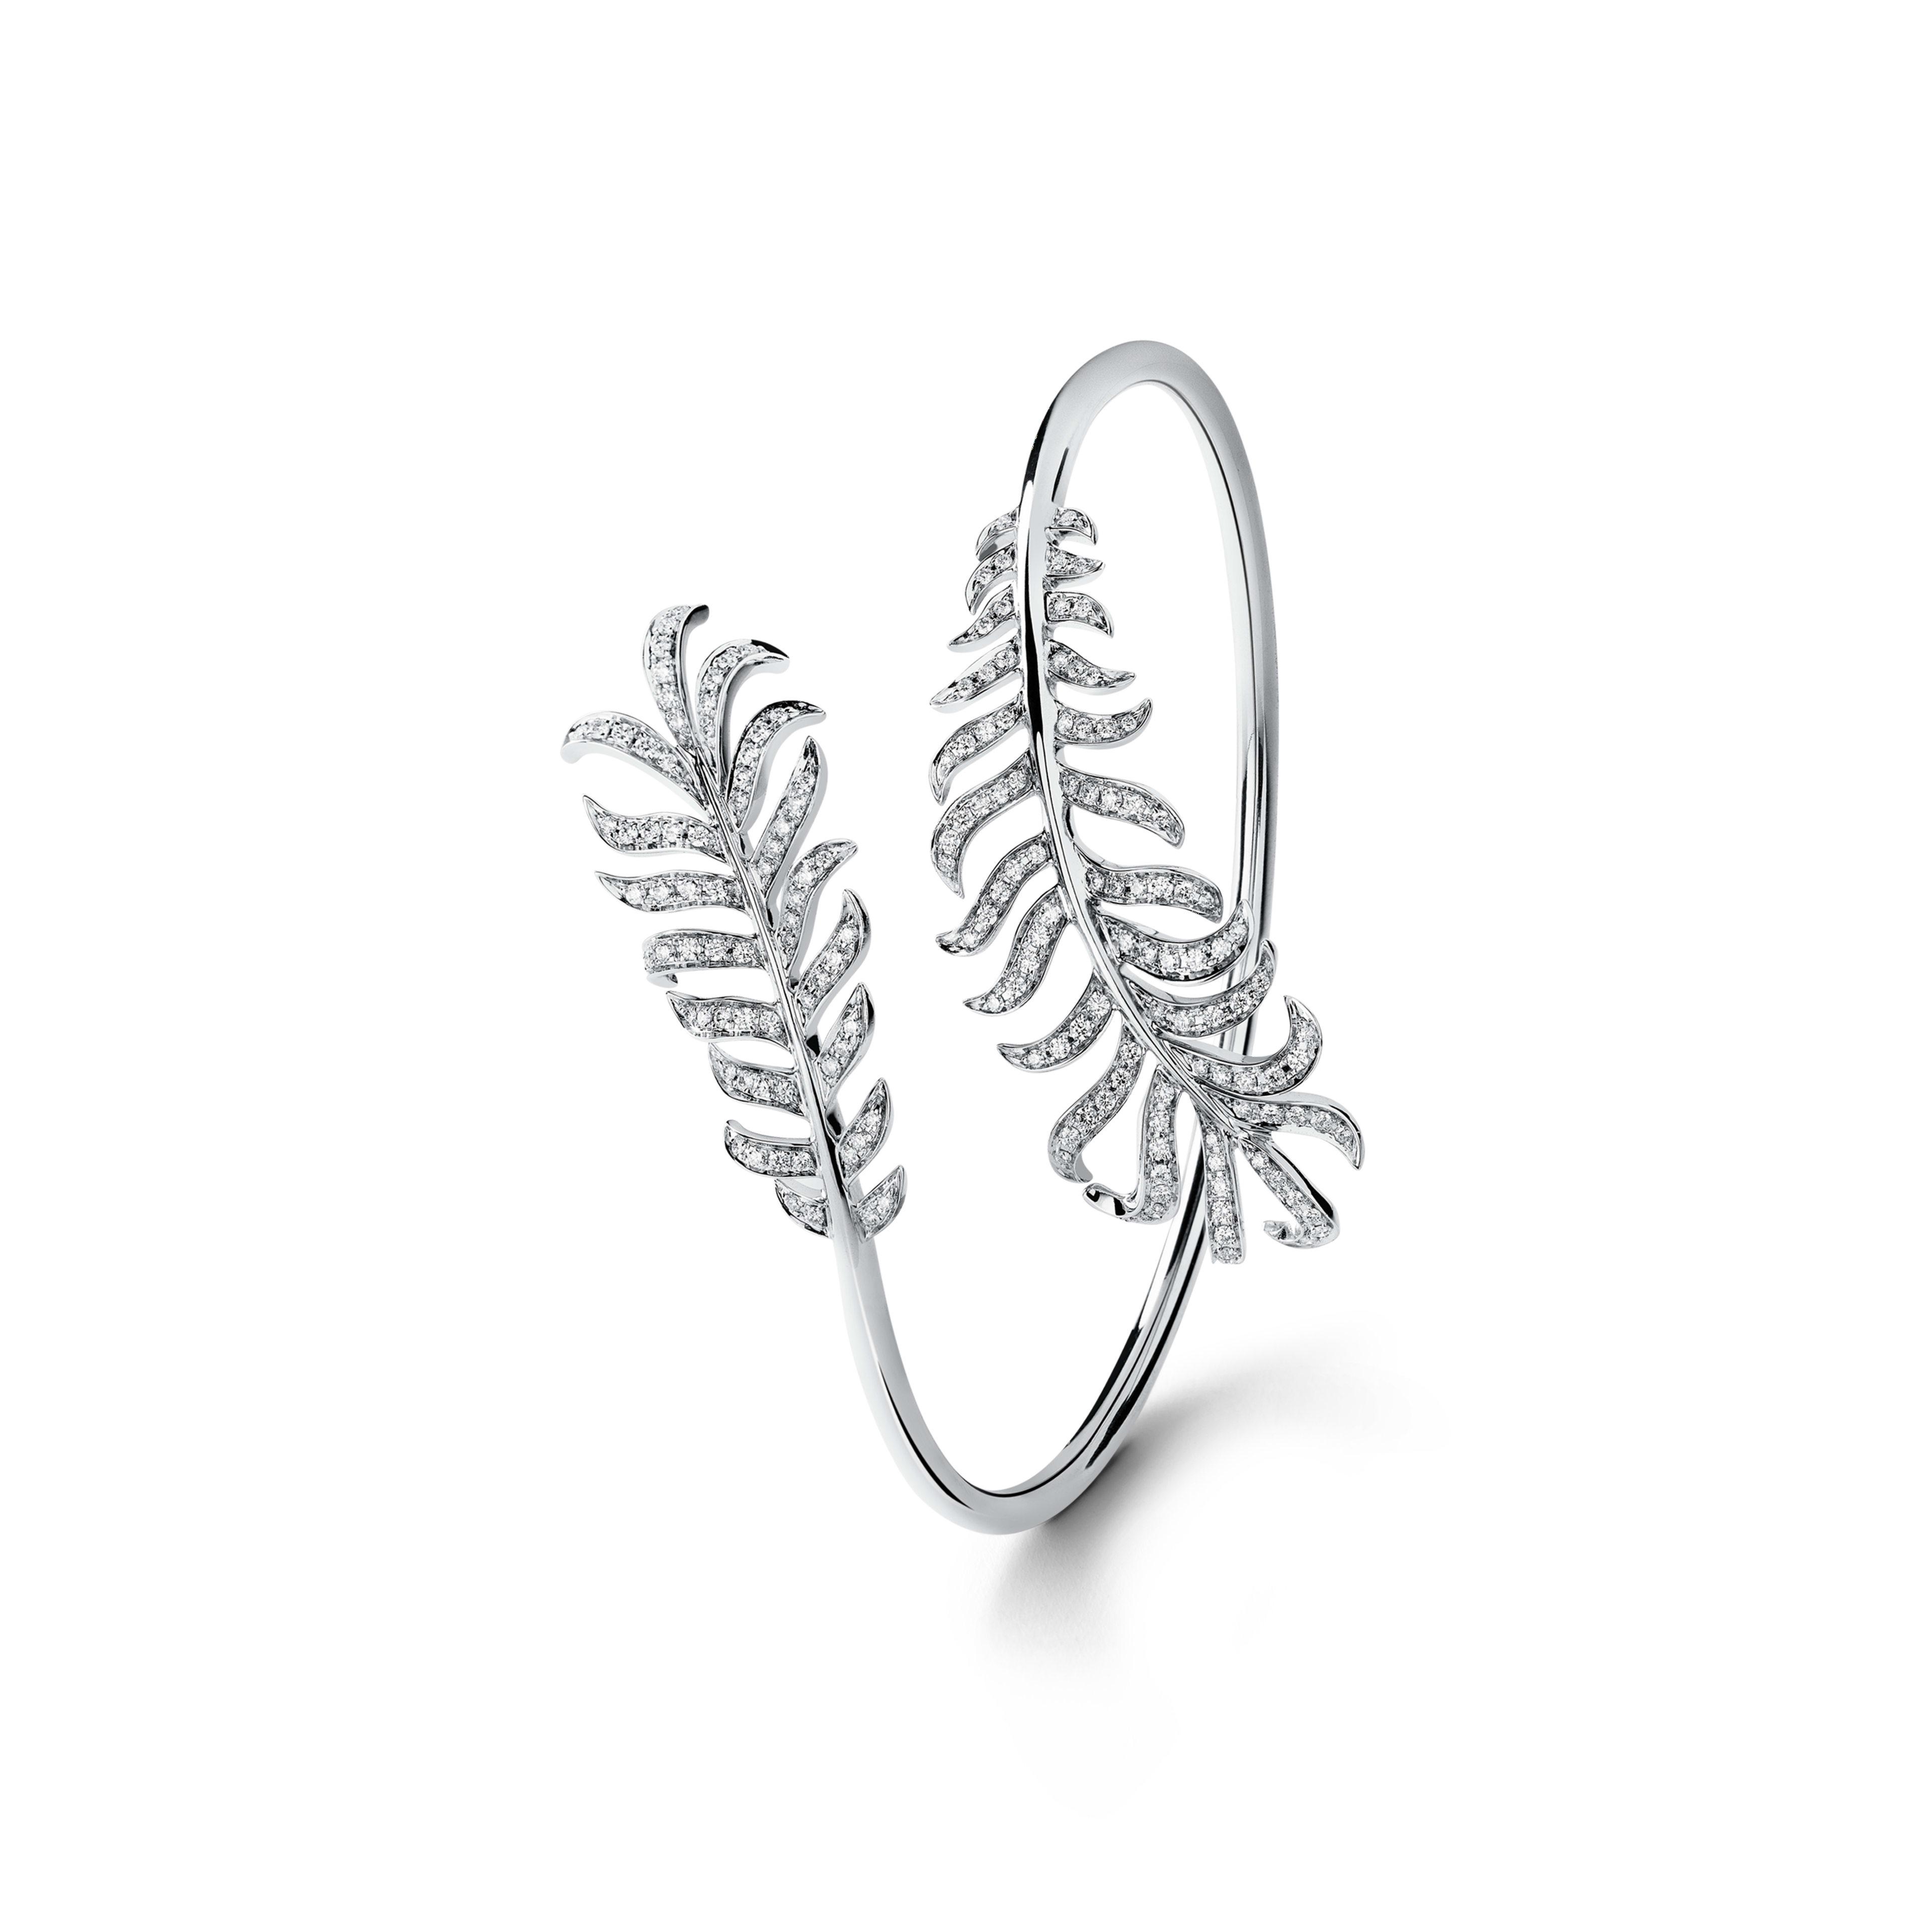 Plume de CHANEL Bracelet - Double Plume bracelet in 18K white gold and diamonds - Default view - see full sized version